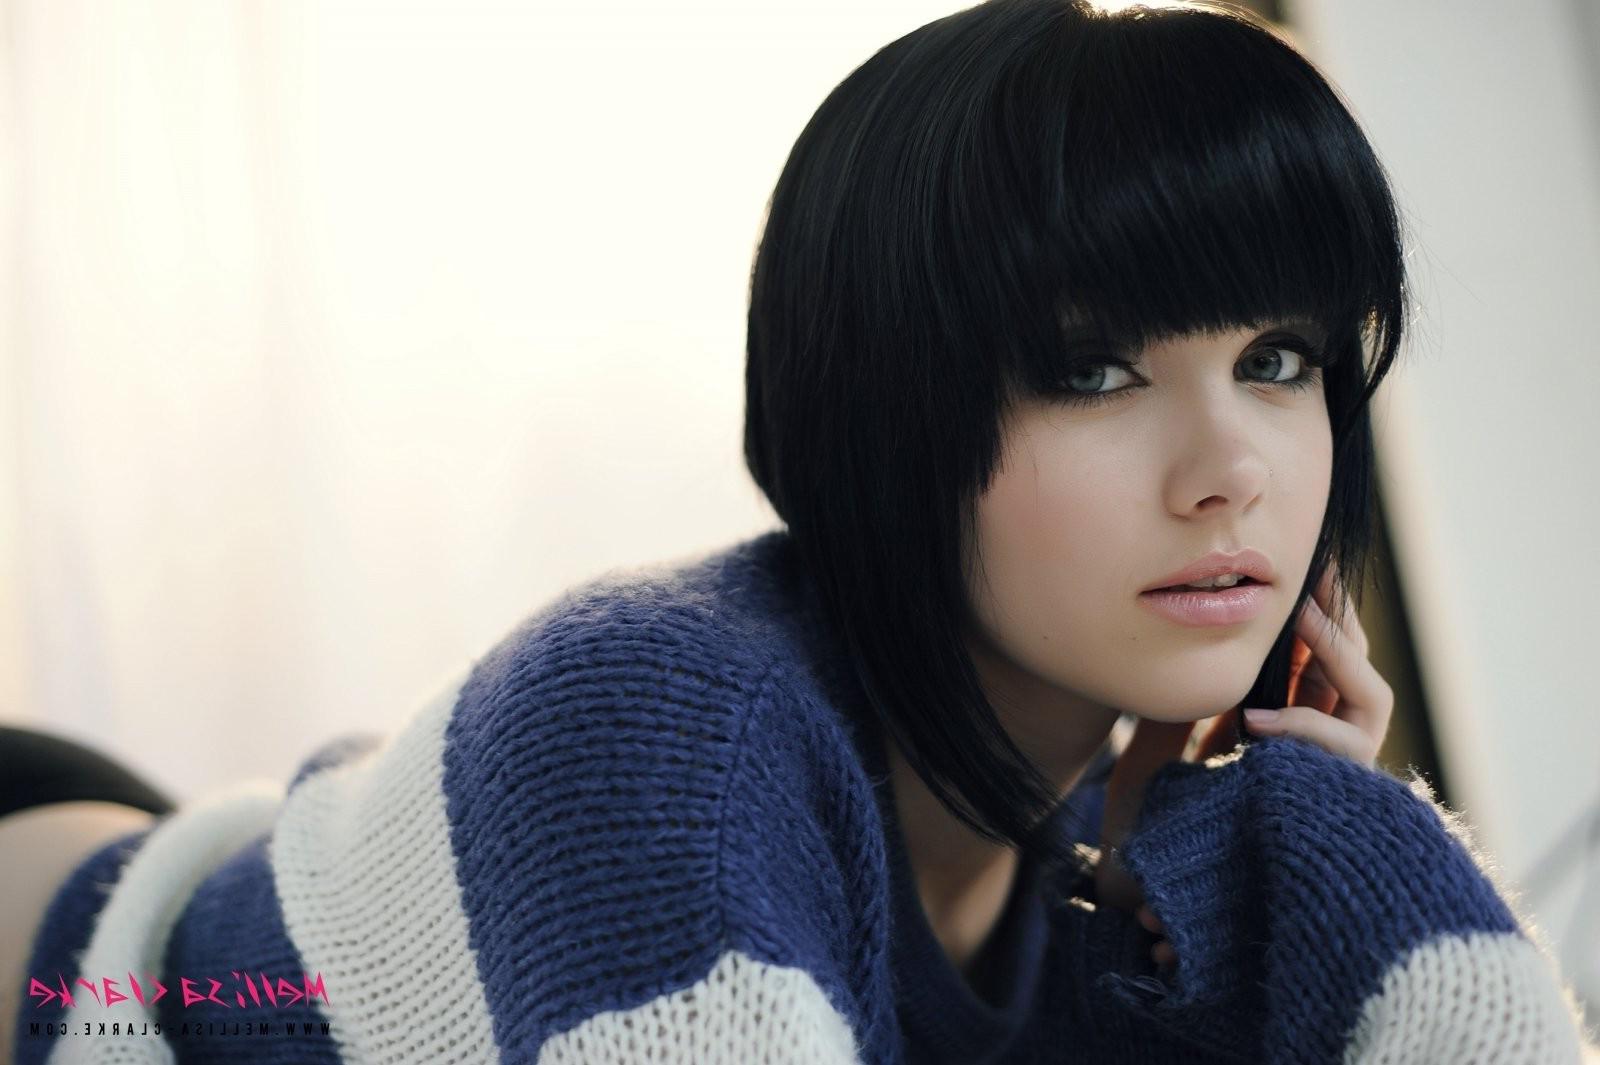 Cute goth girl